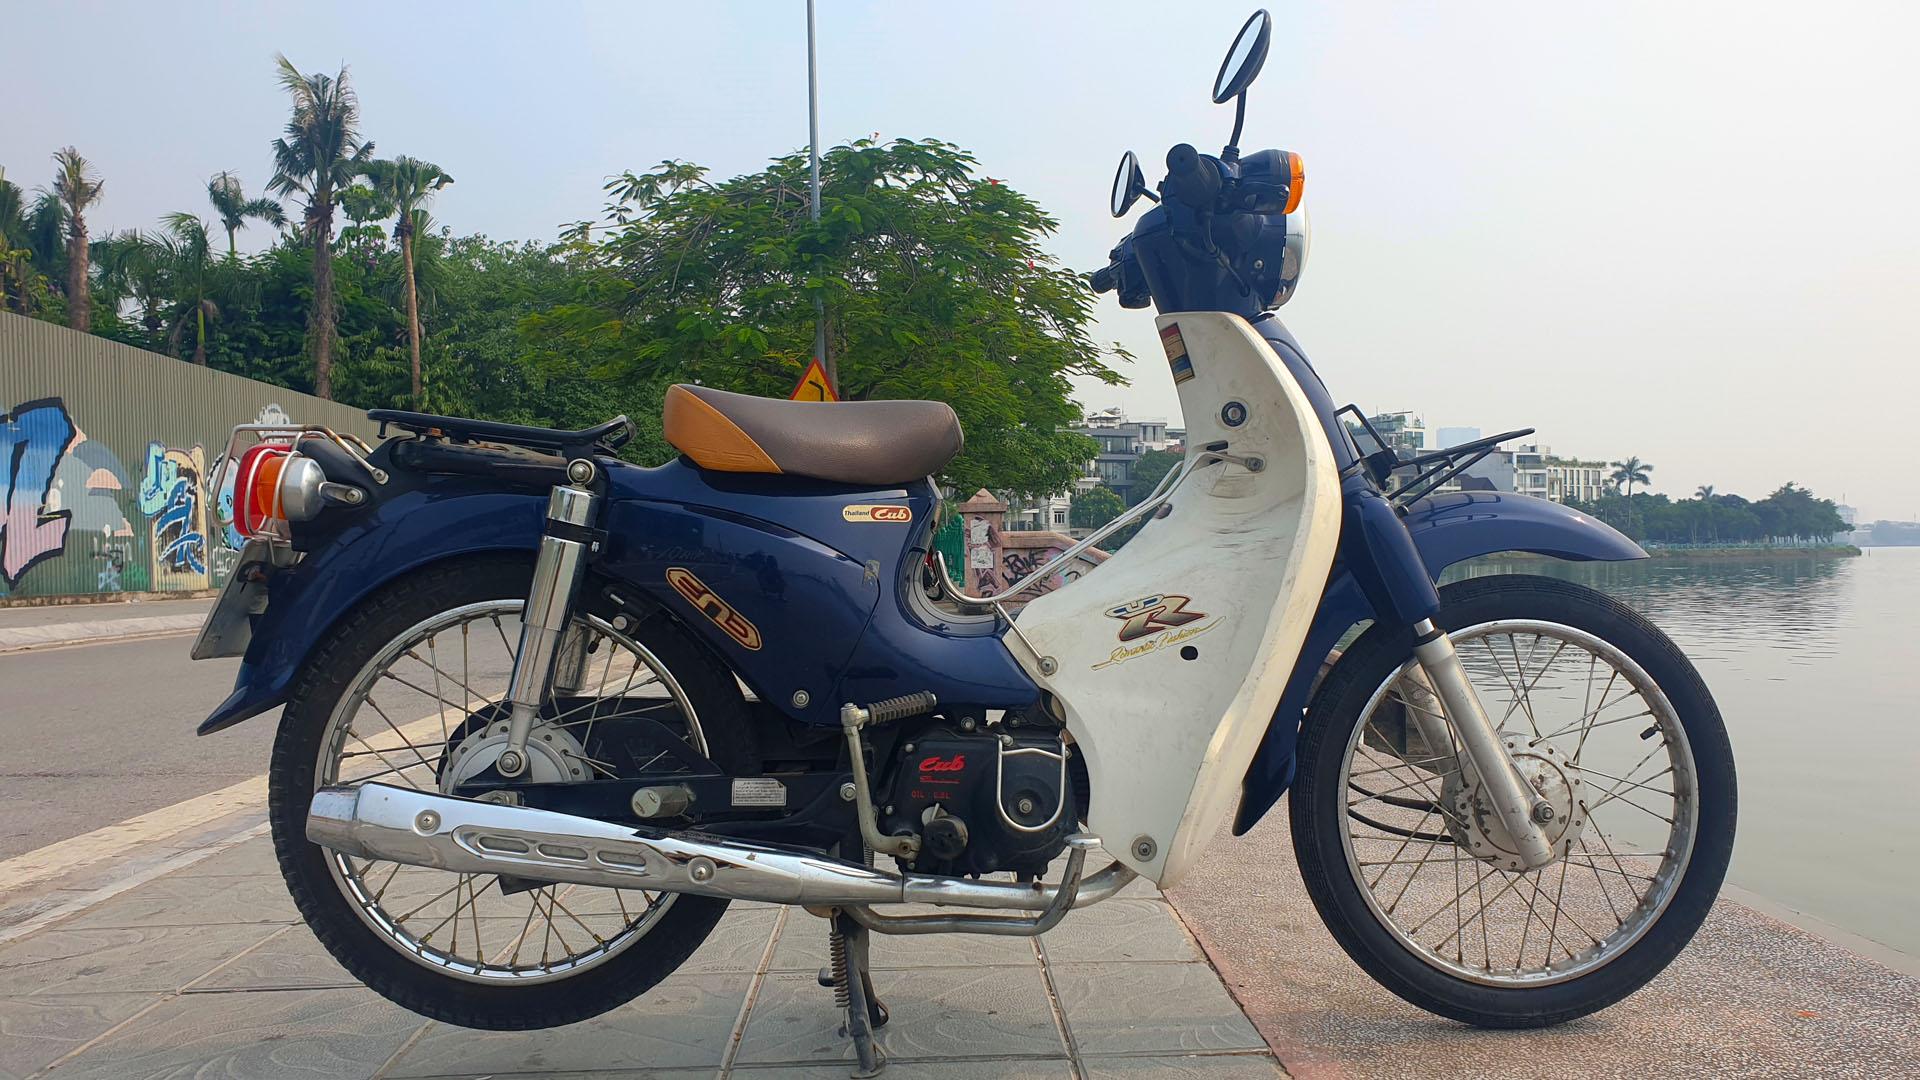 Honda Cub - right wide